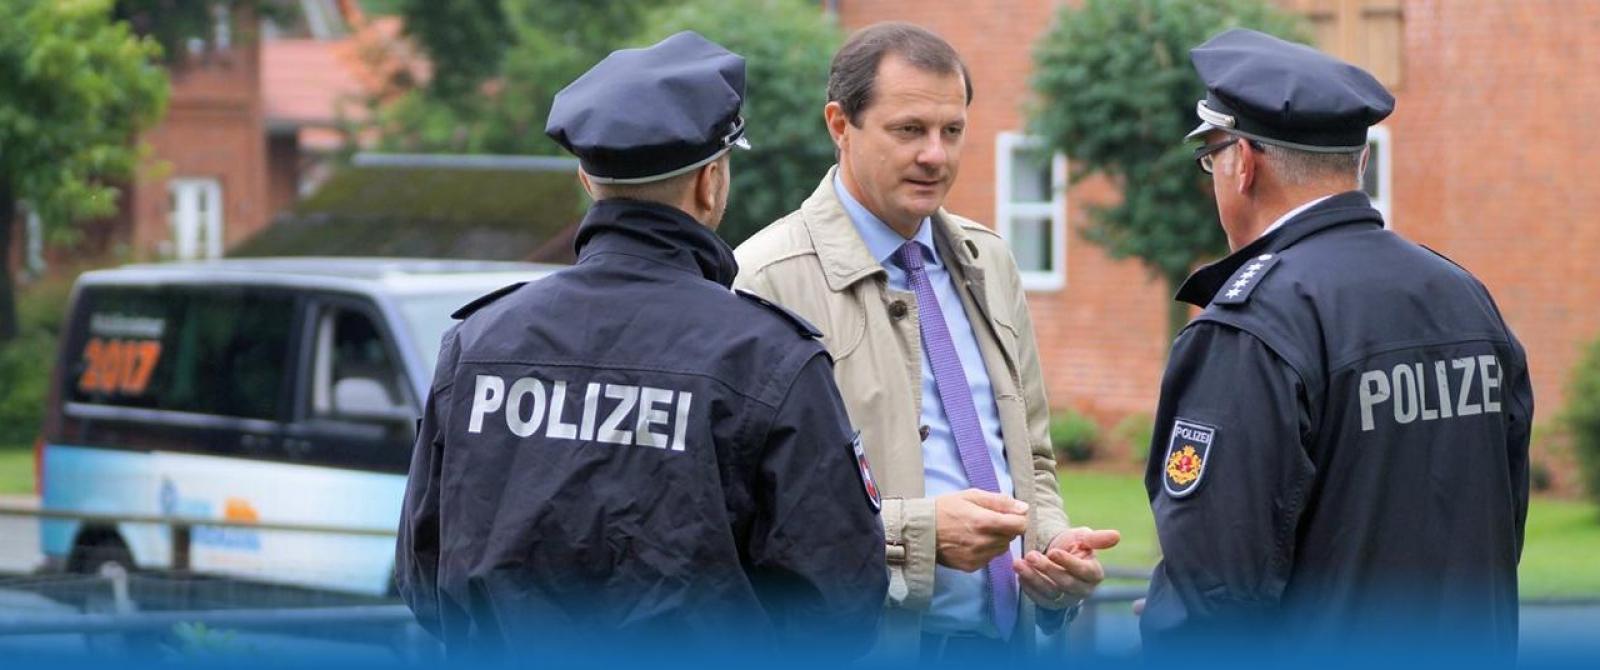 oliver-grundmann-stade-rotenburg-politiker-cdu-berlin-bundestag-mdb (19)